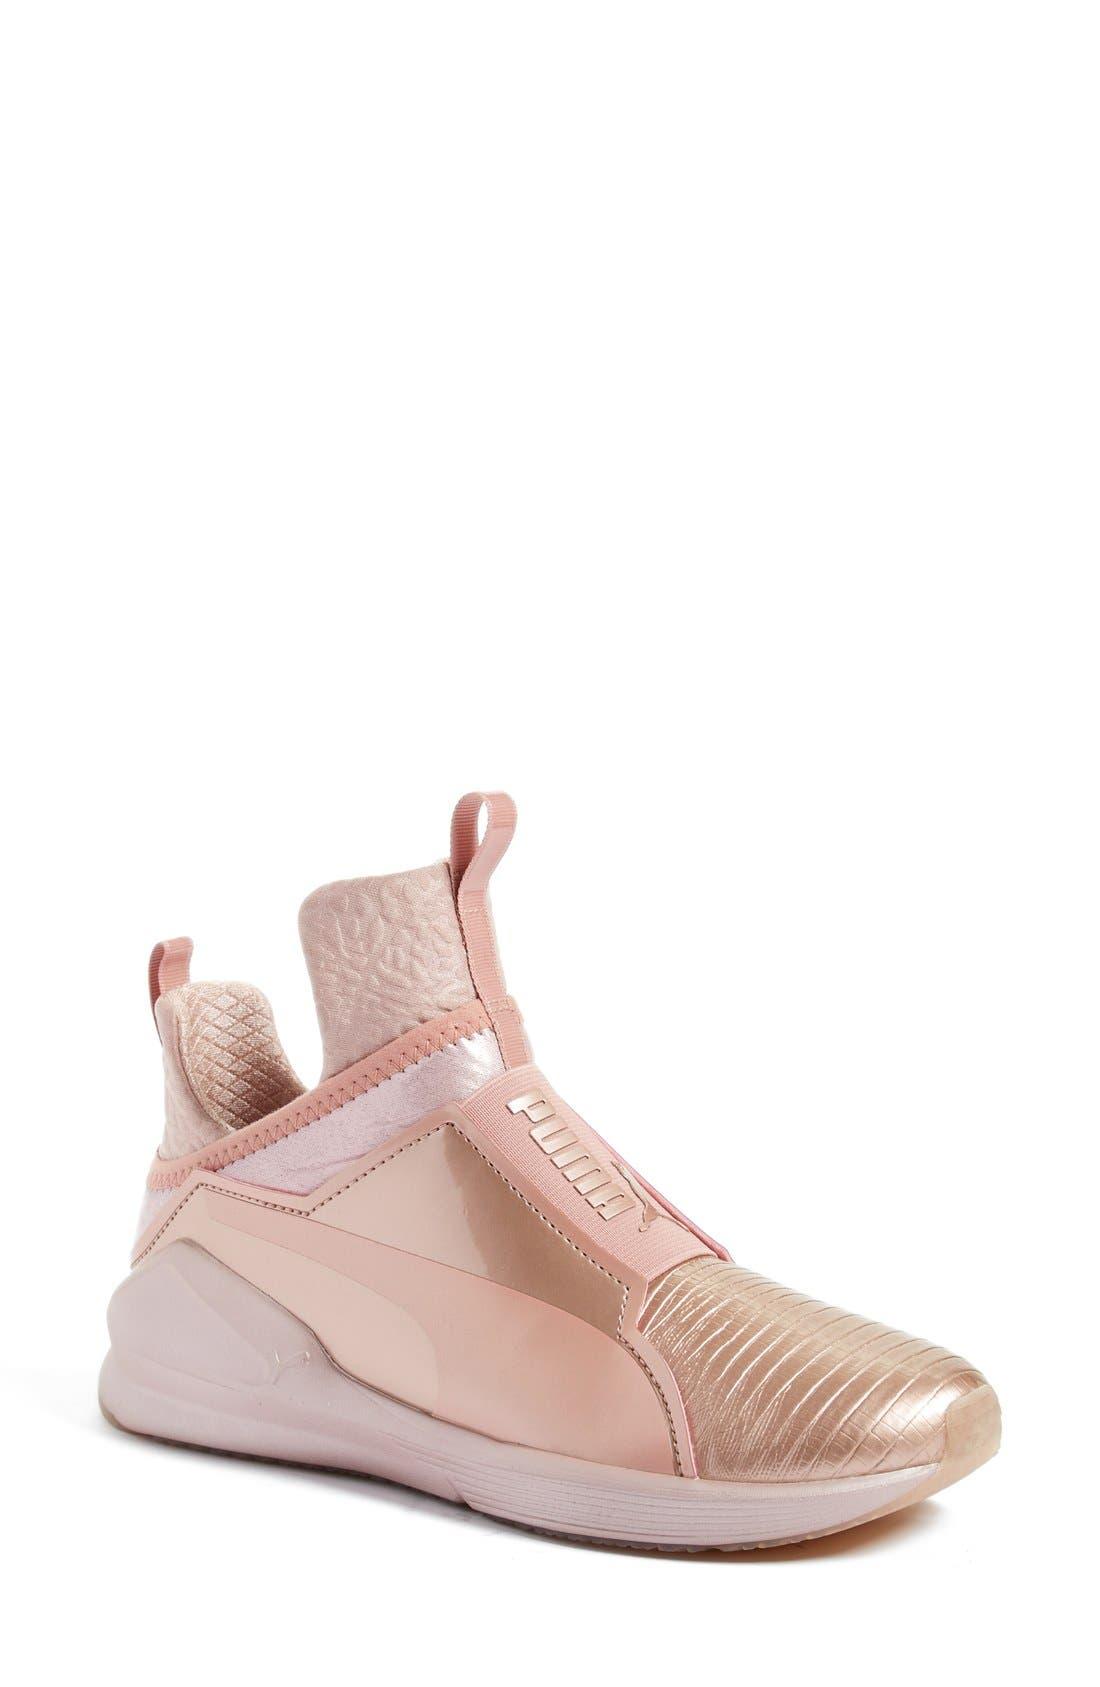 Fierce Metallic High Top Sneaker,                         Main,                         color, Rose Gold